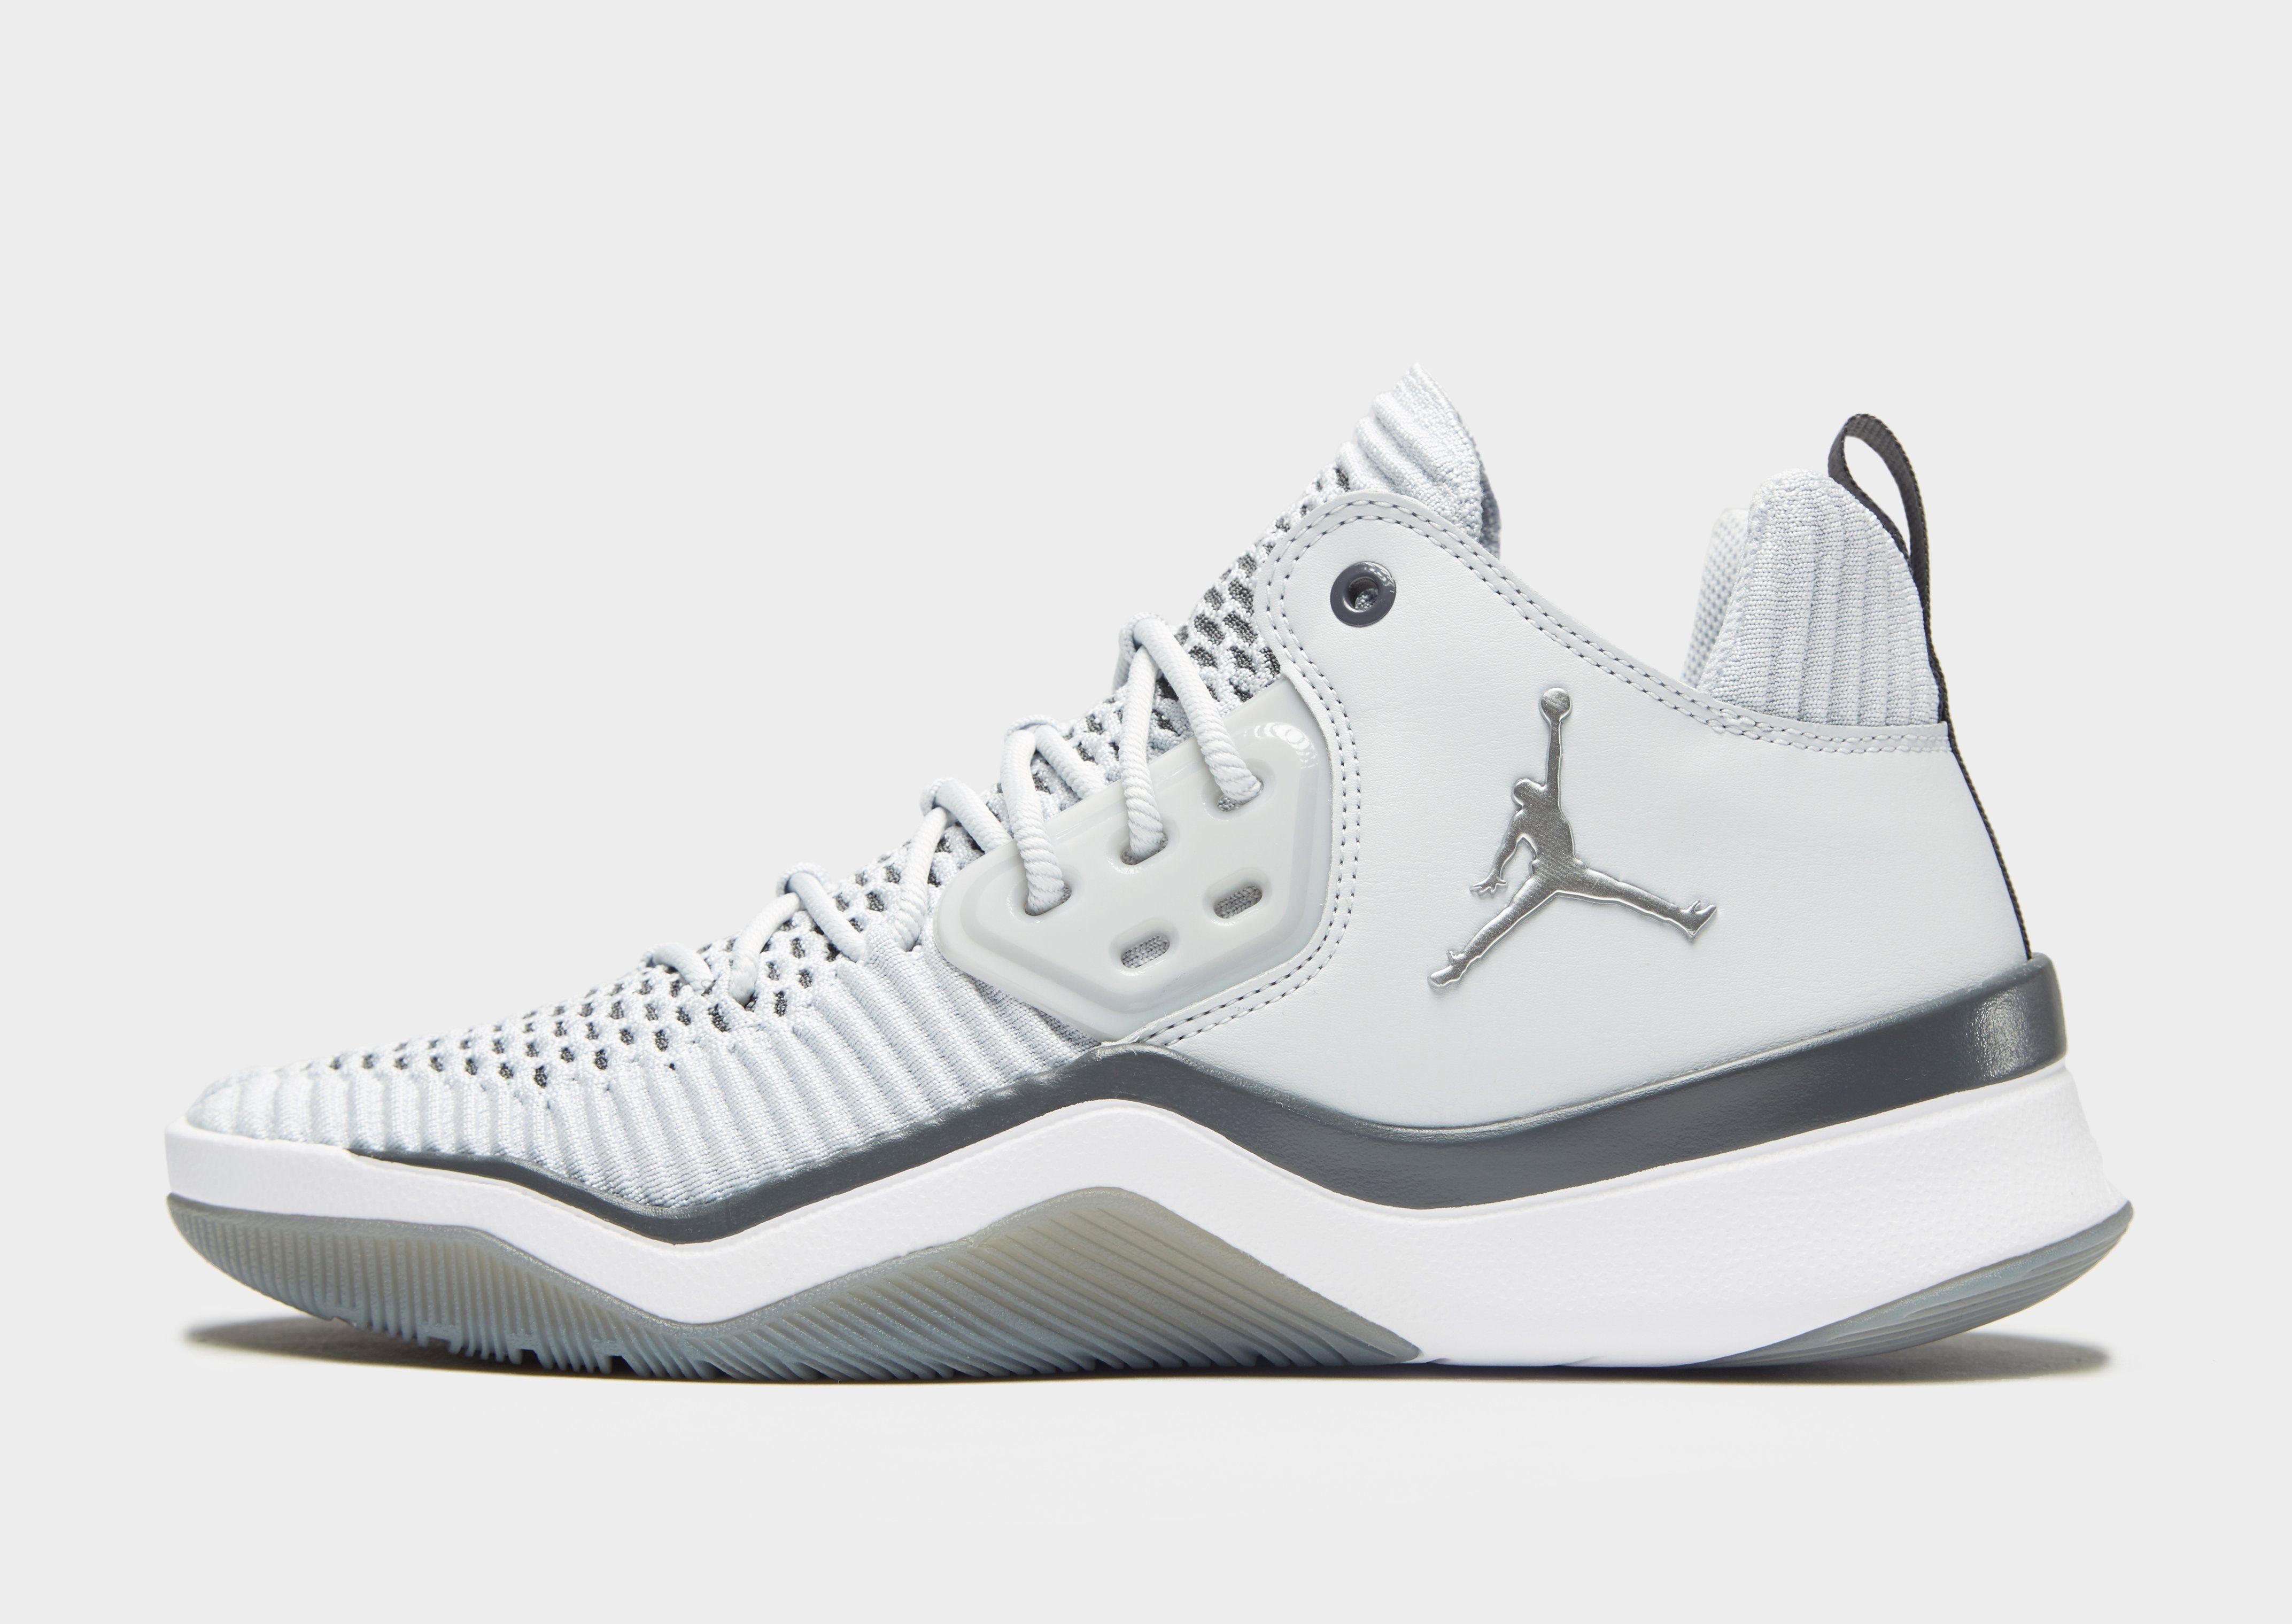 0bac143700d NIKE Jordan DNA LX Men's Shoe | JD Sports